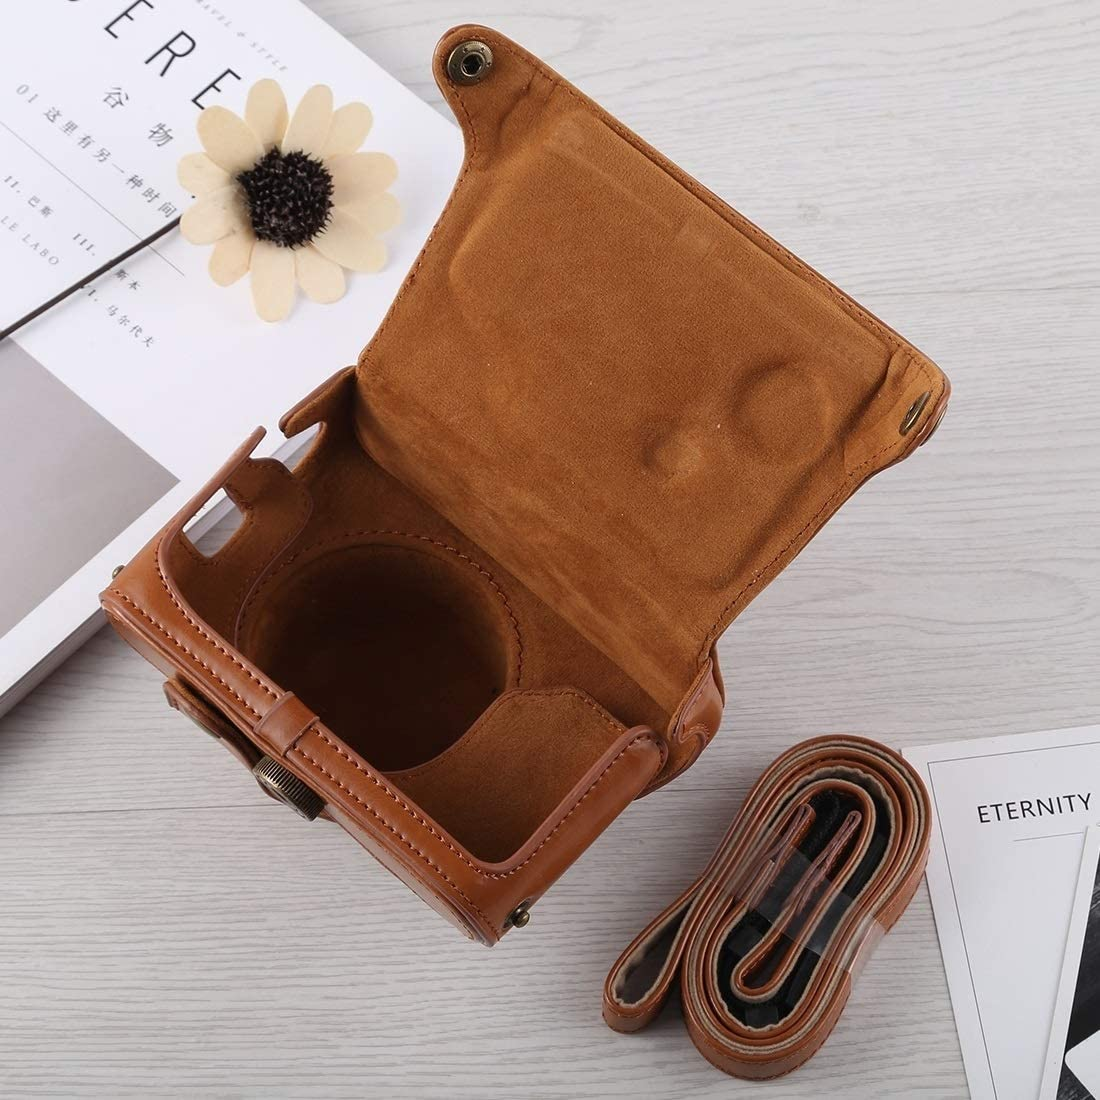 Color : Black Black Ychaoya Camera Bag Wuzpx Entire Body Camera PU Leather Case Bag with Strap for Fujifilm X100F